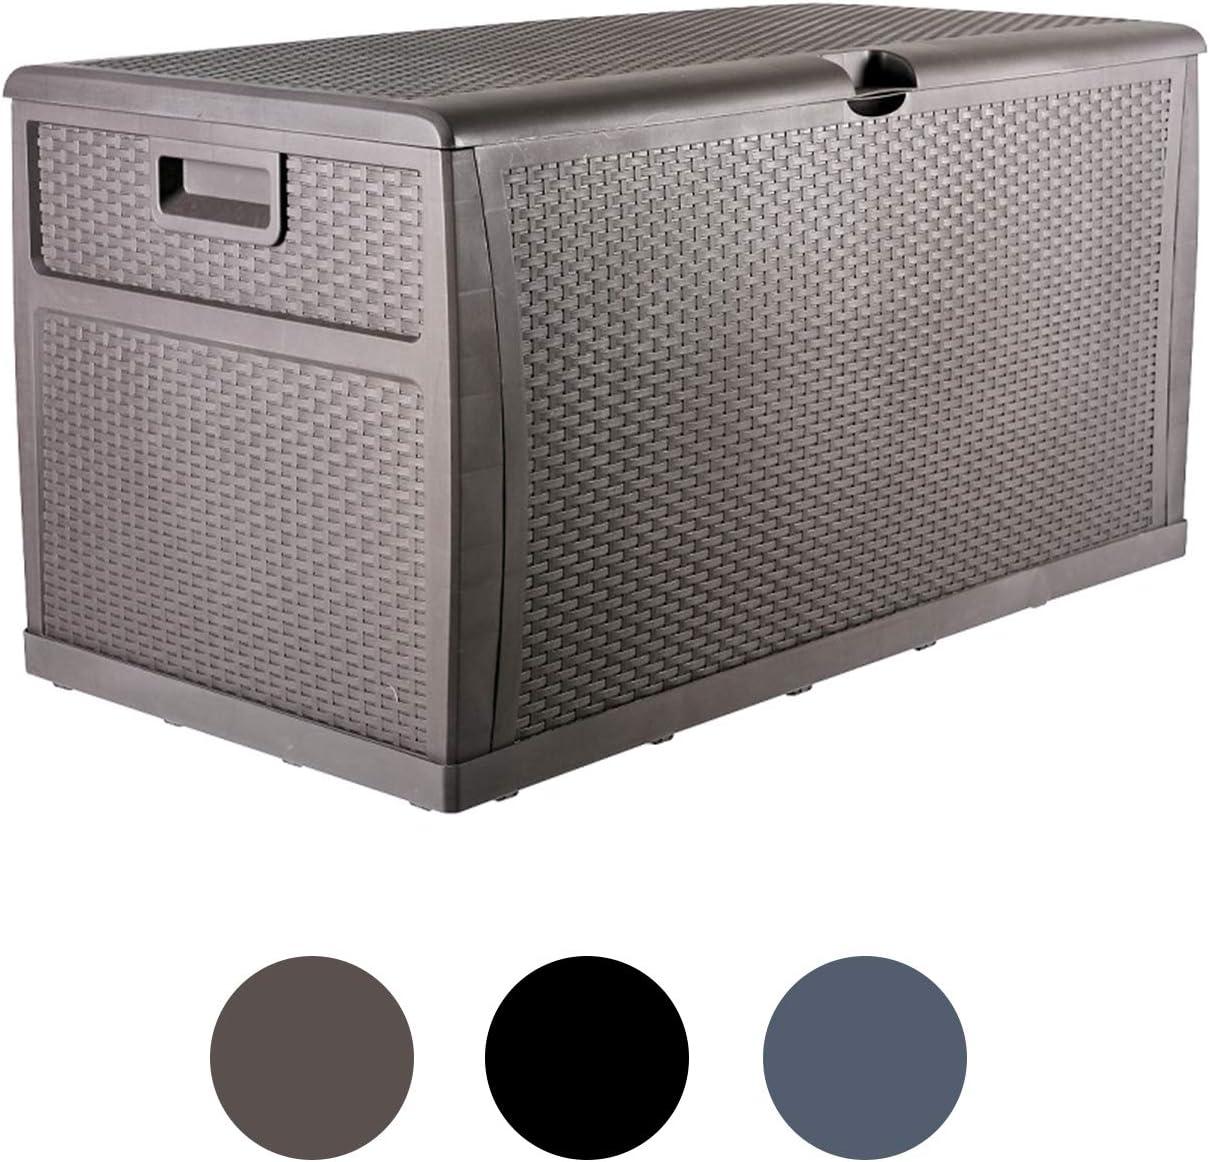 Plastic Deck Box Wicker 120 Gallon , Brown - Waterproof Storage Container Outdoor Patio Garden Furniture